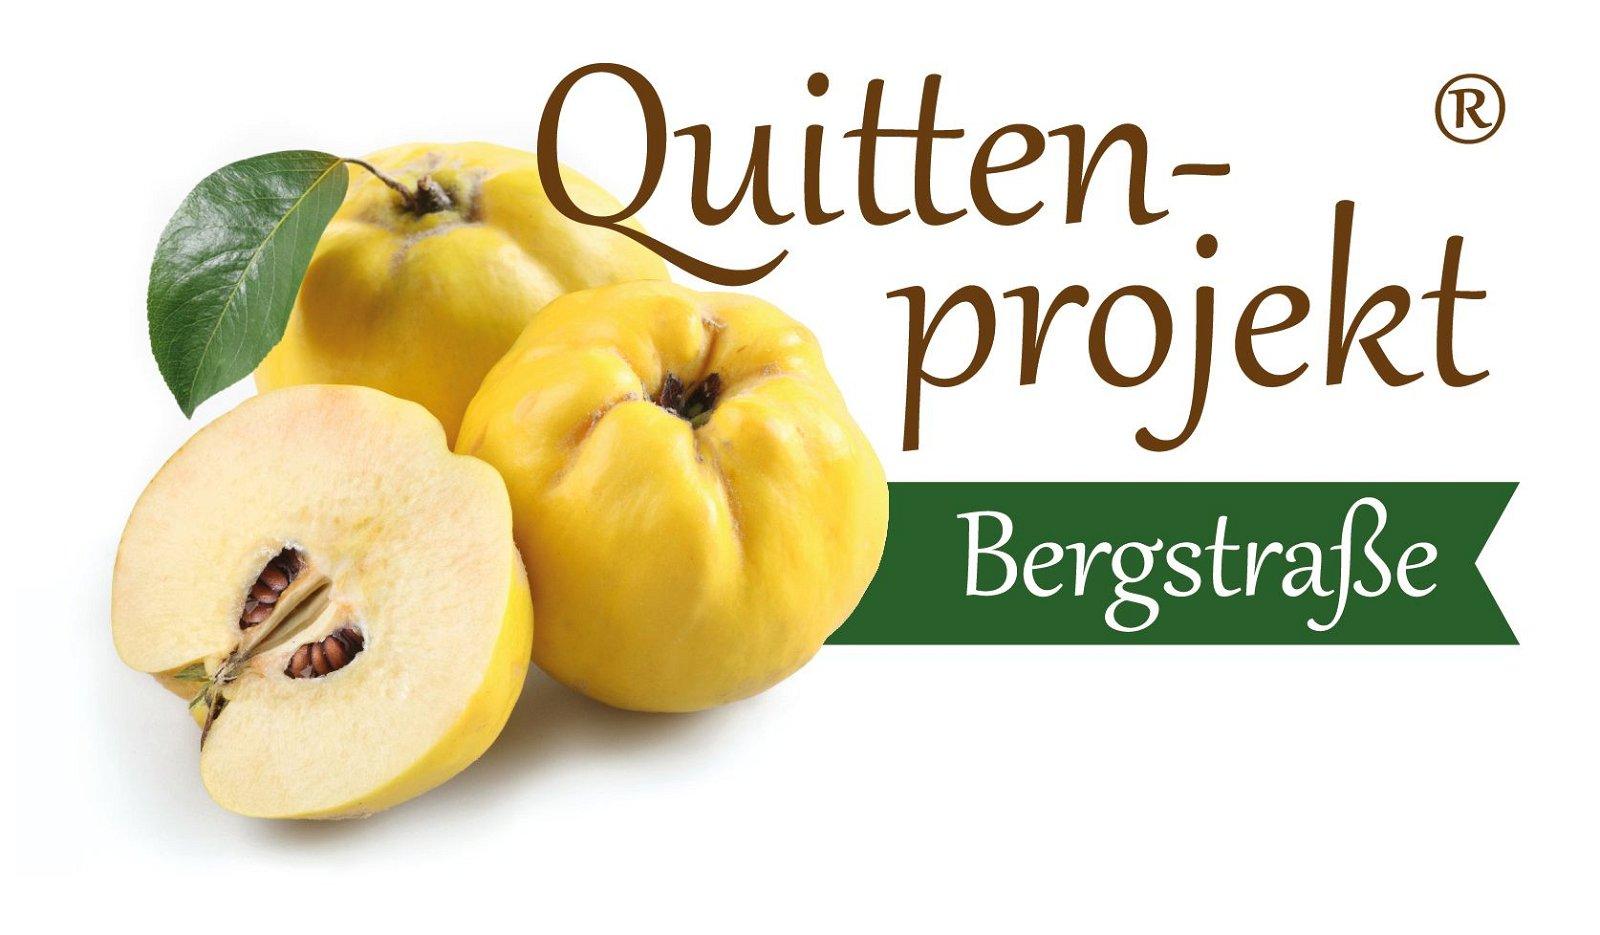 Quittenprojekt Bergstraße